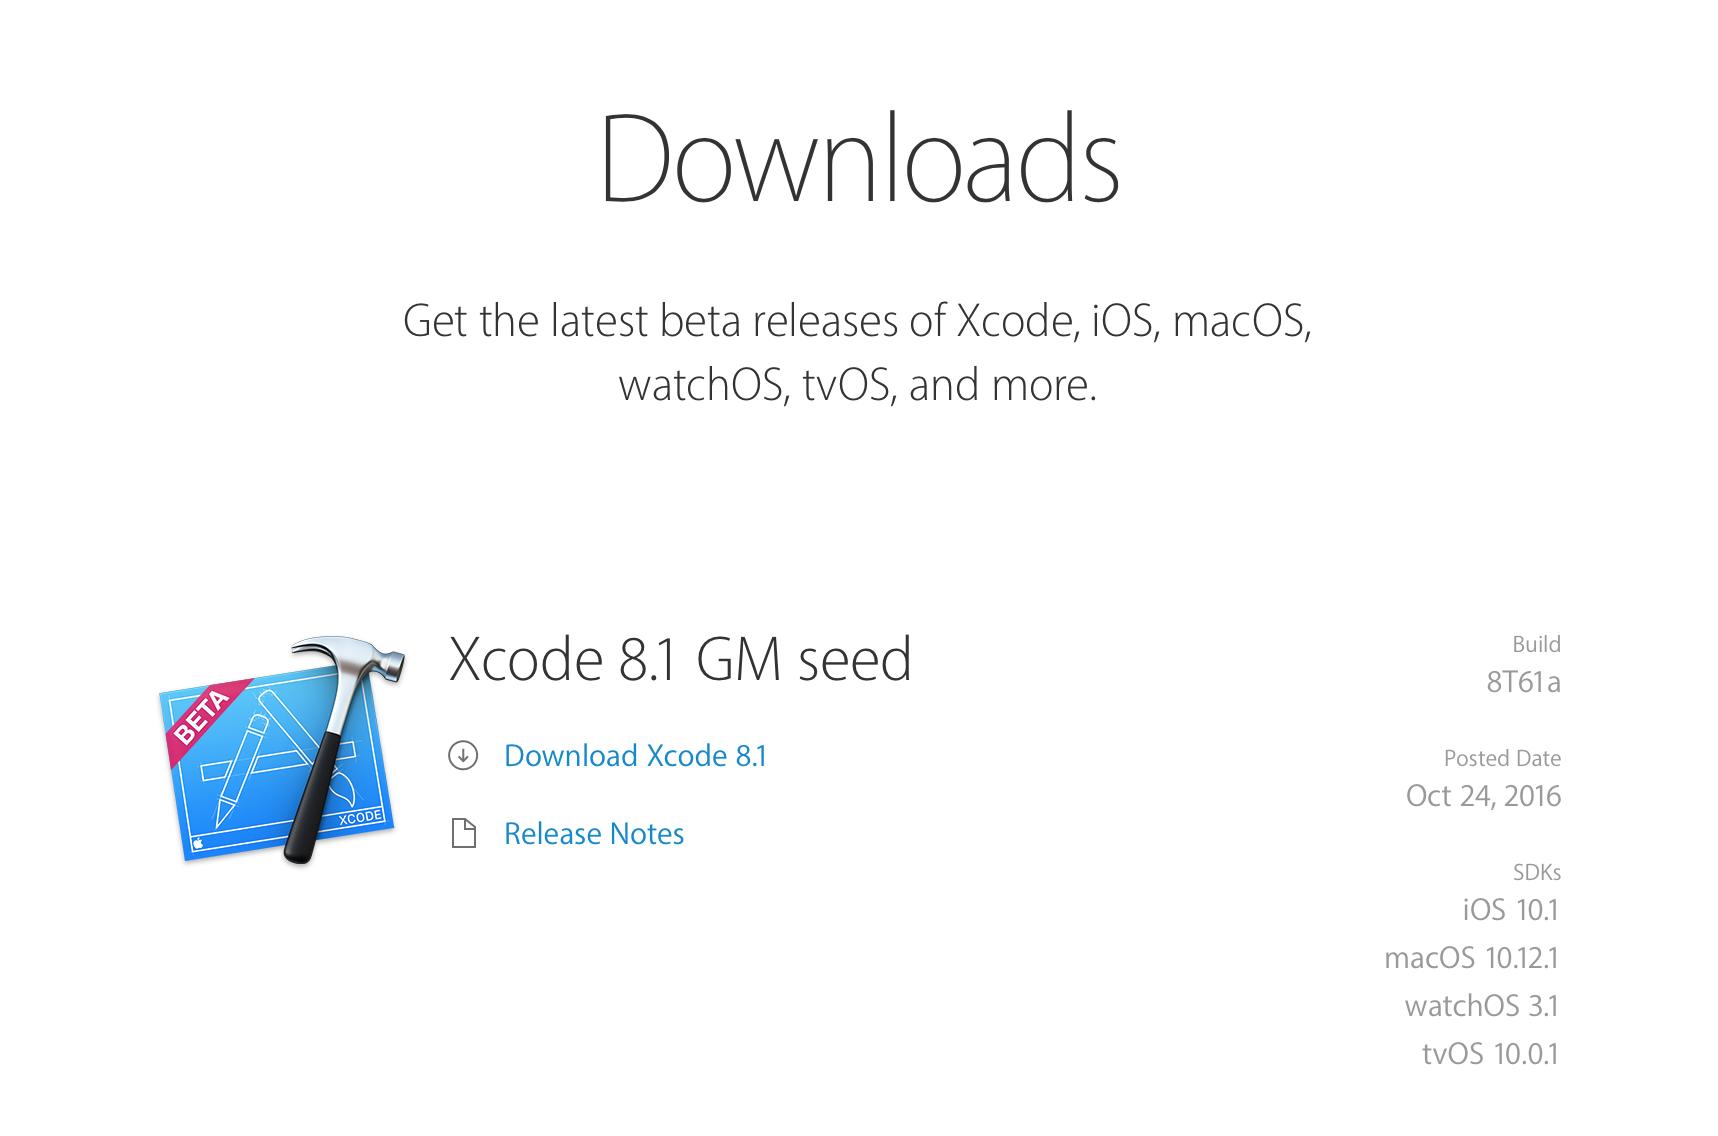 Xcode 8.1 GM seed 개발자 공개